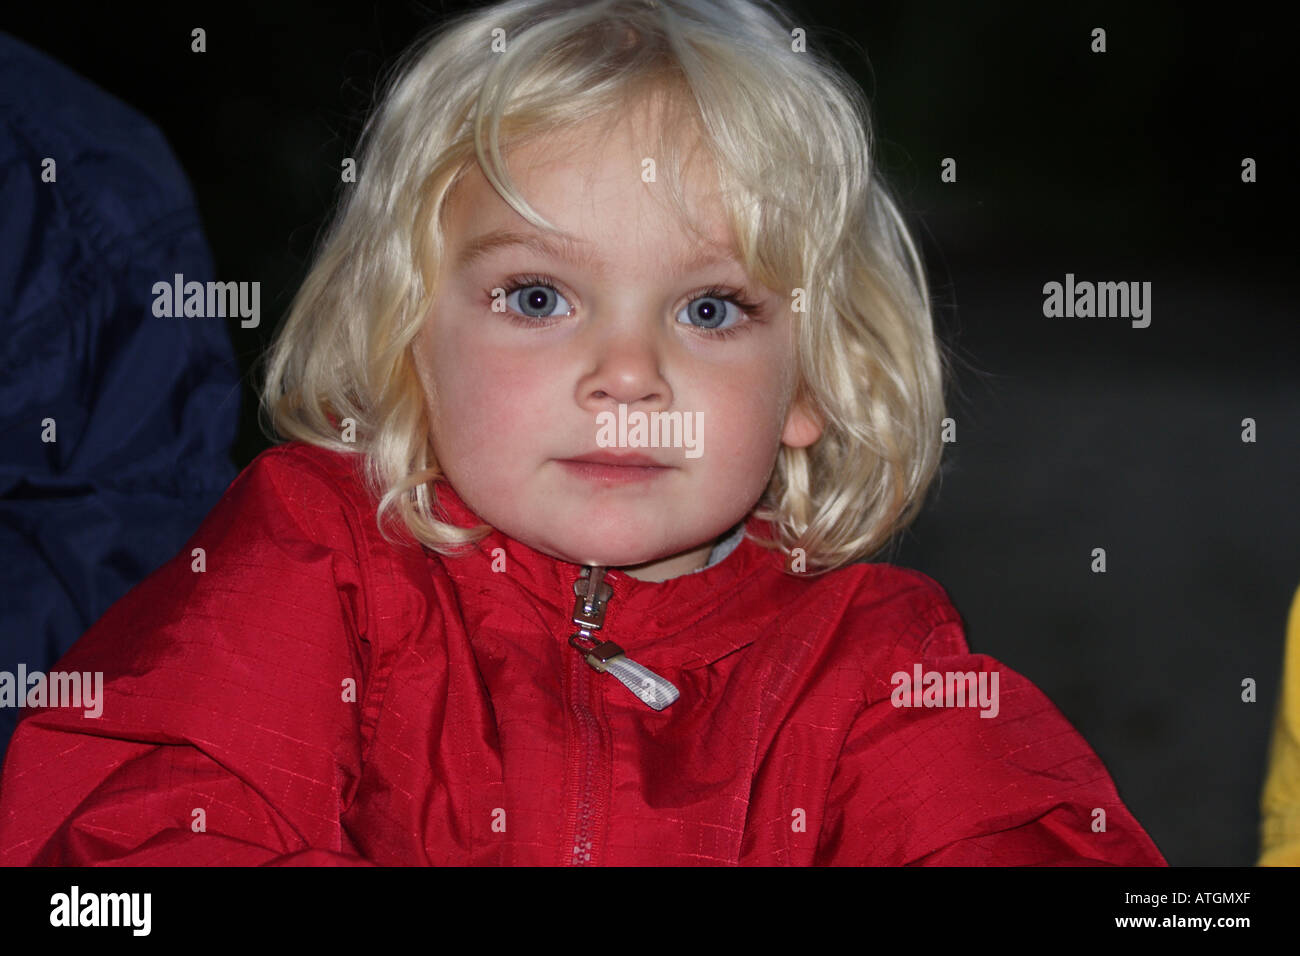 Blondy beatifull girl. - Stock Image